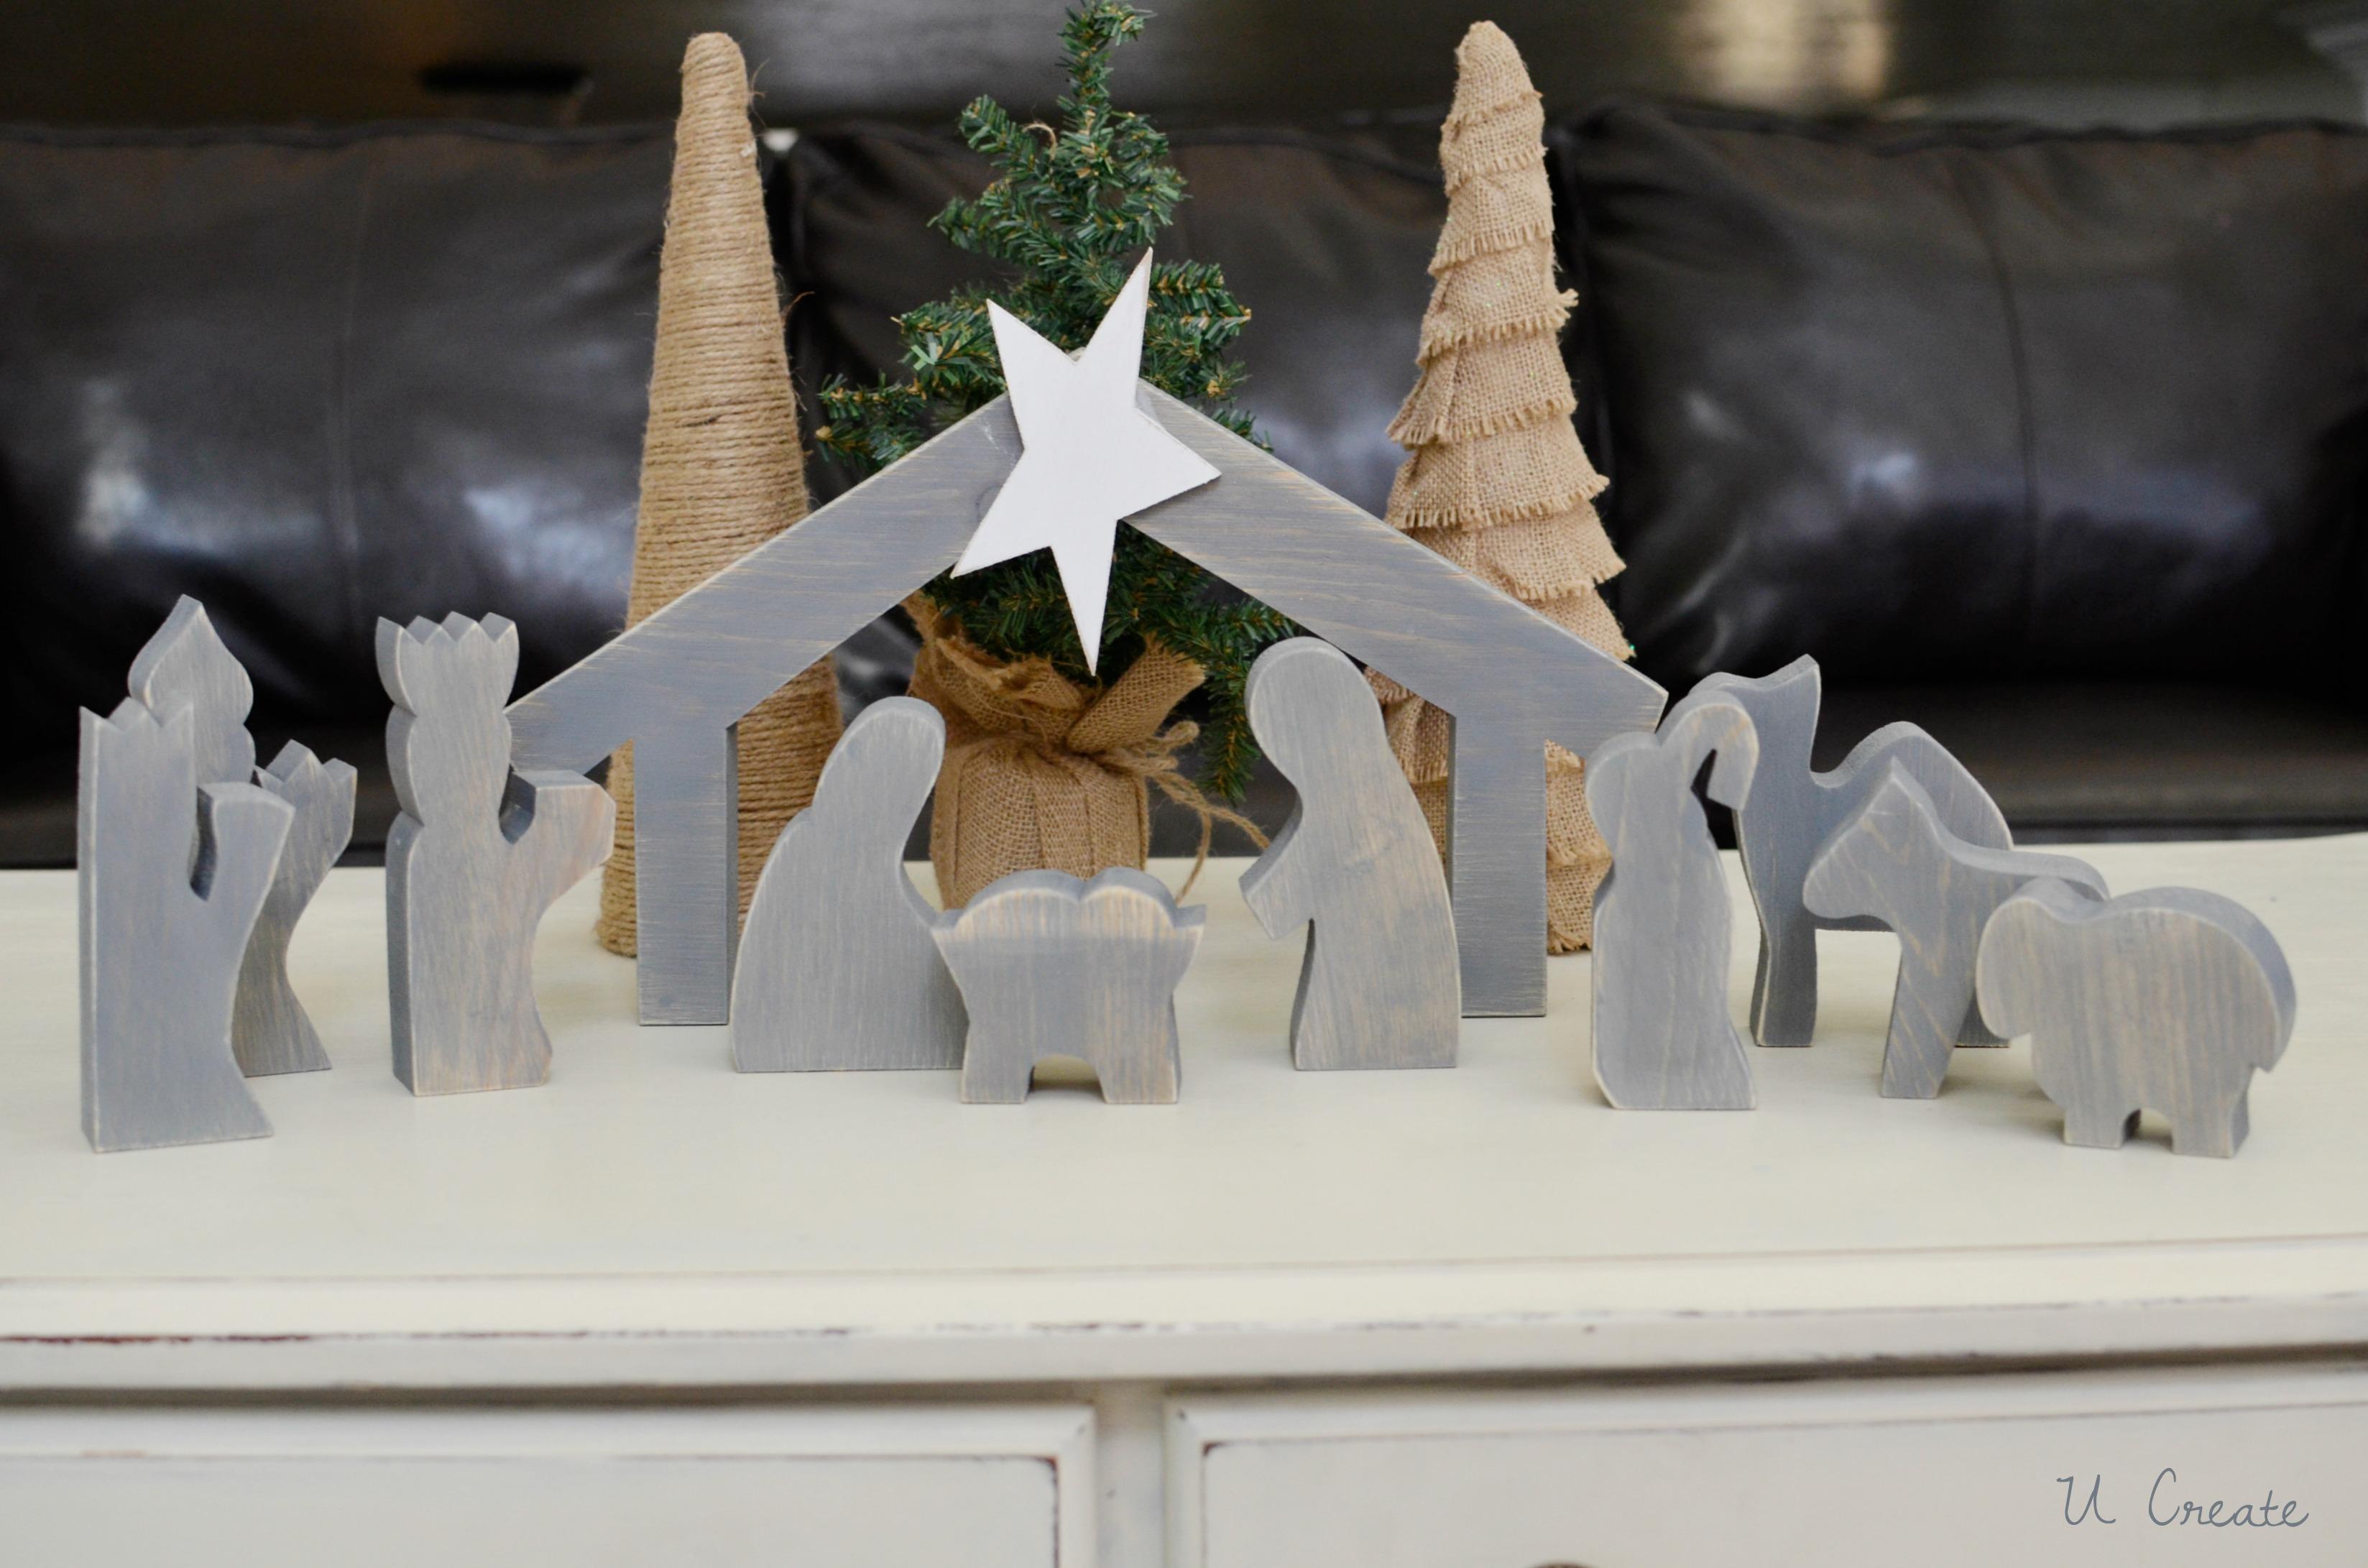 wooden nativity tutorial at u create - Wooden Nativity Set